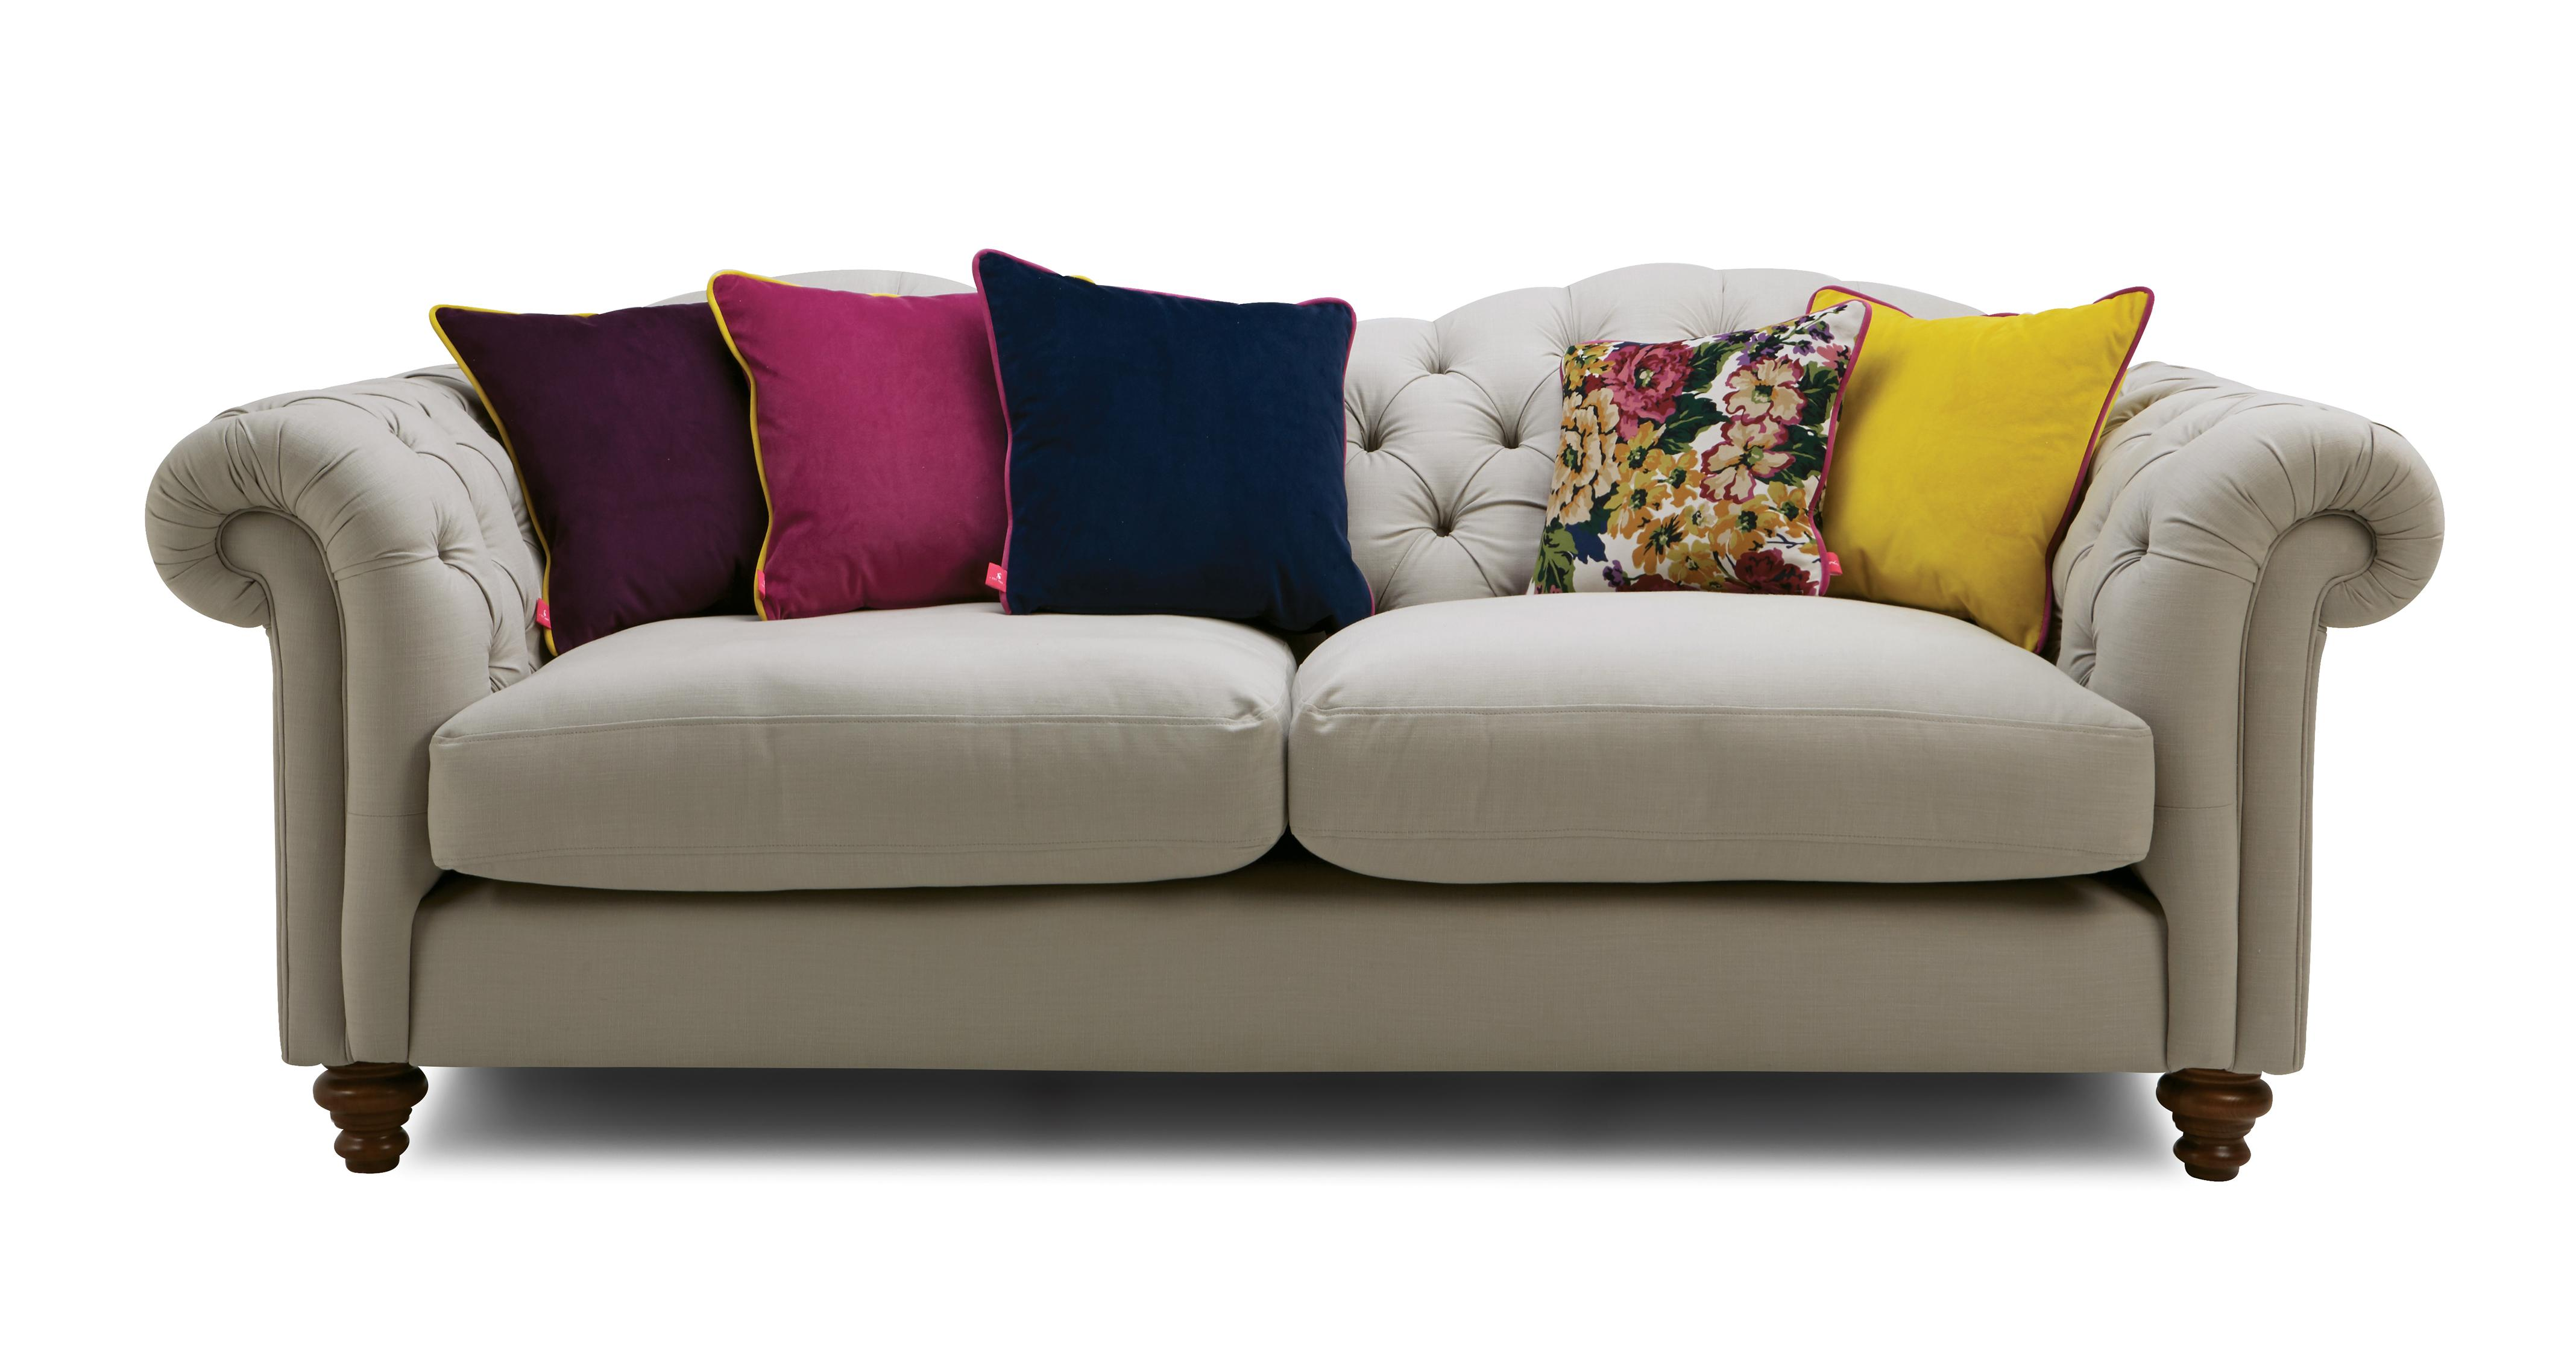 Windsor Cotton 4 Seater Sofa Windsor Cotton Dfs